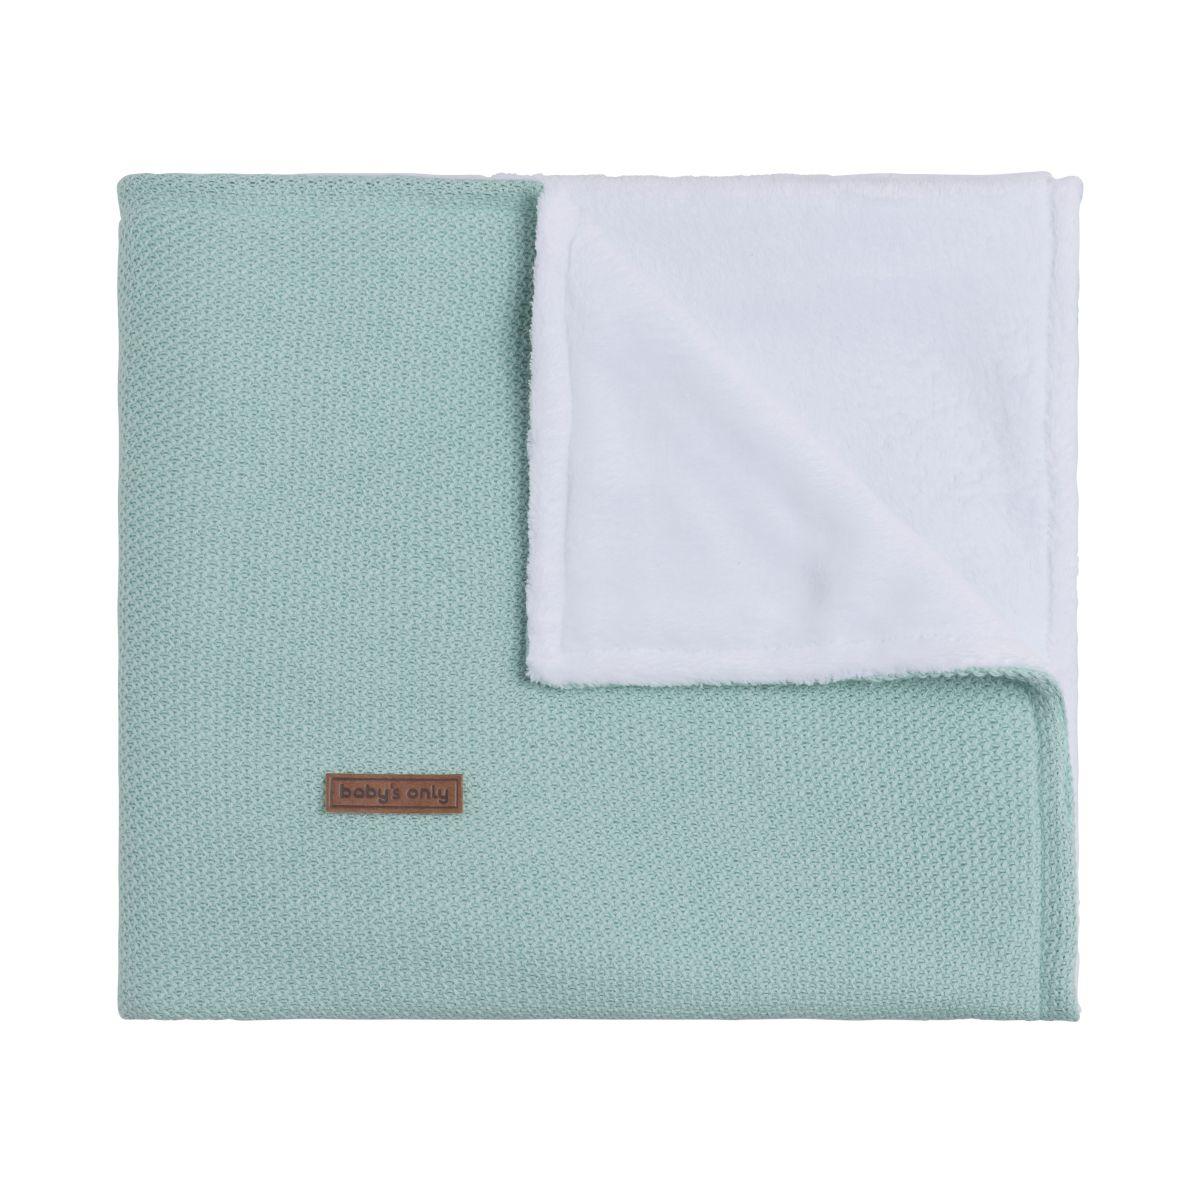 baby crib blanket teddy classic mint